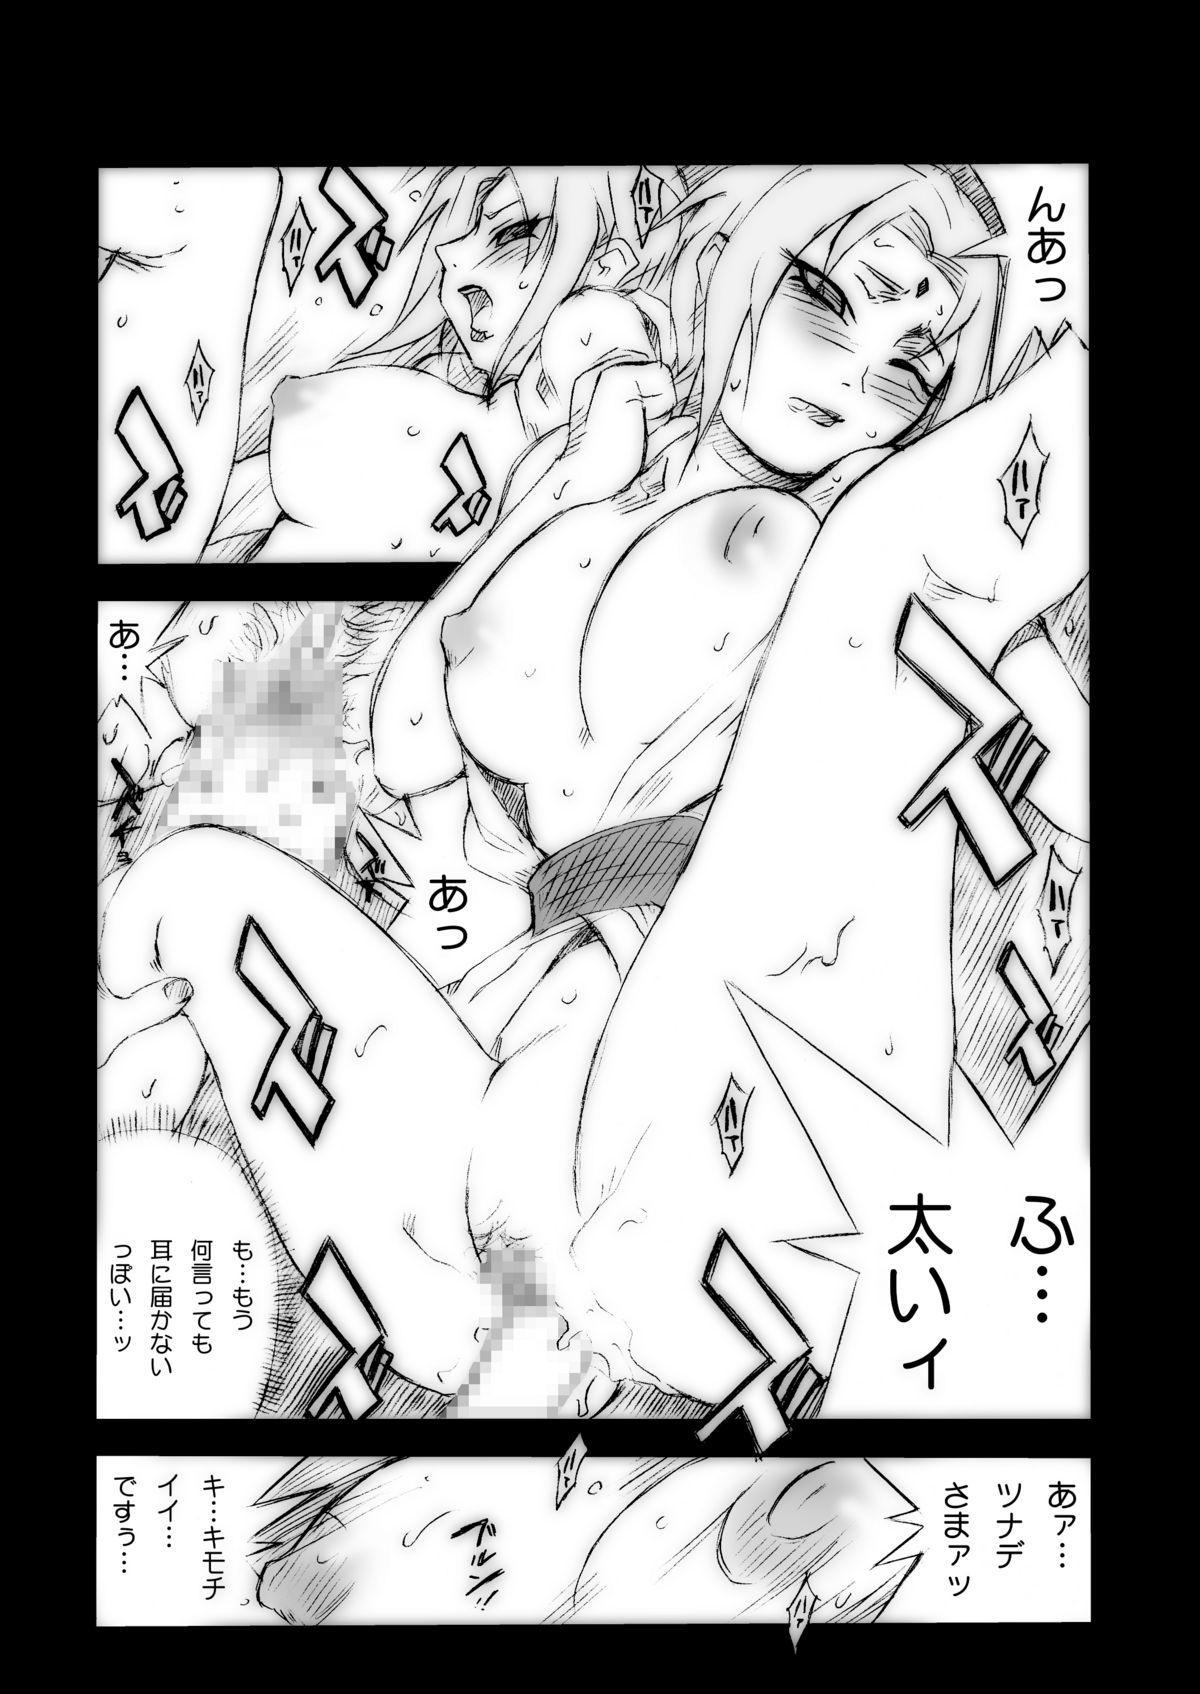 [MG WORKS (Isou Doubaku) Q.N.T DL (Naruto) [Digital] 56